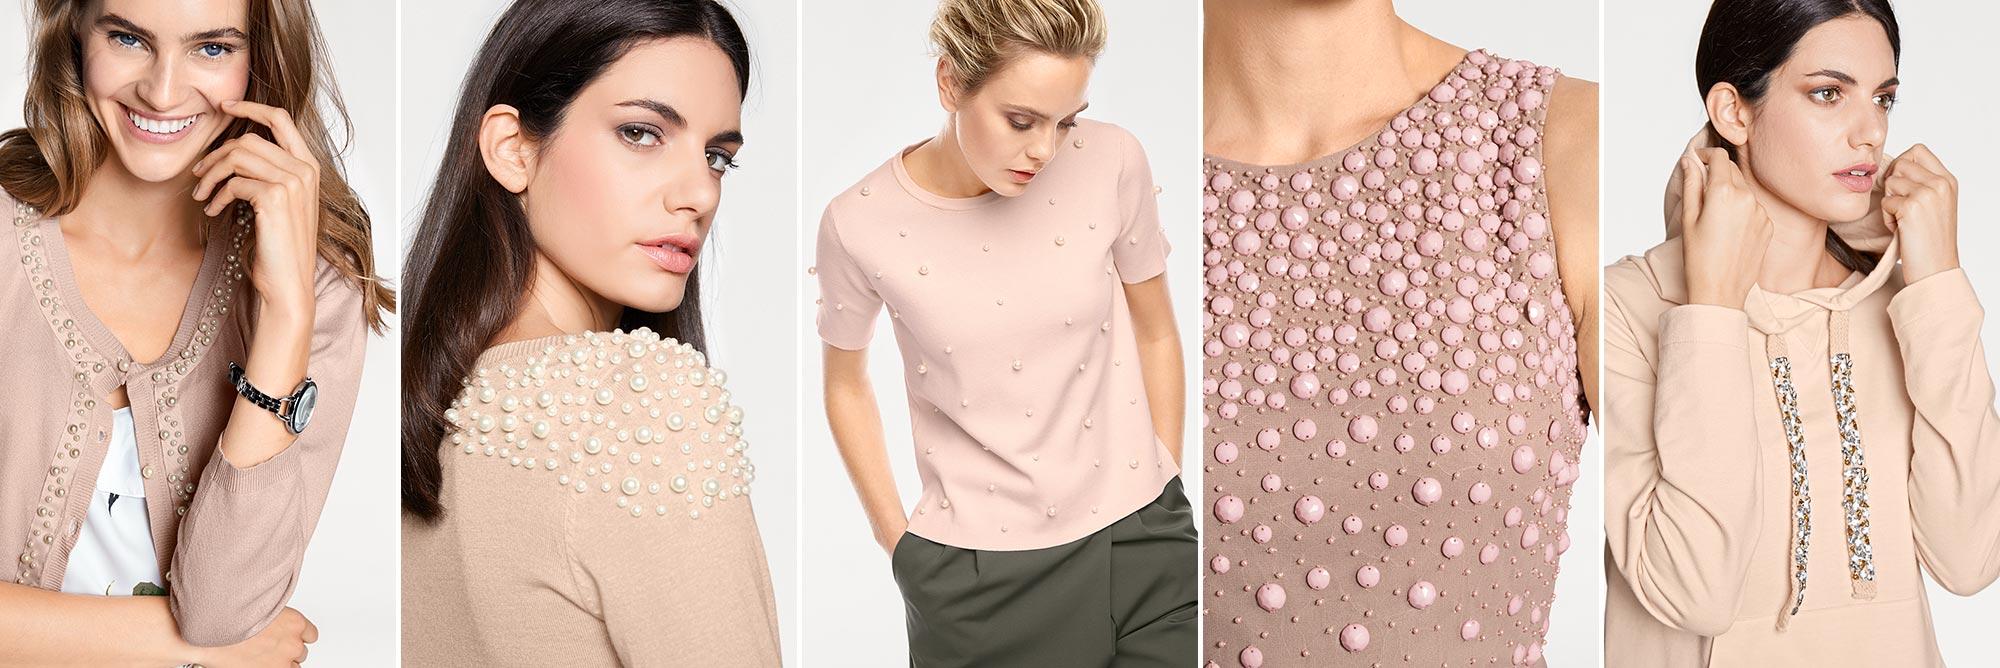 Kollage Perlenbestickte Kleidung rosa